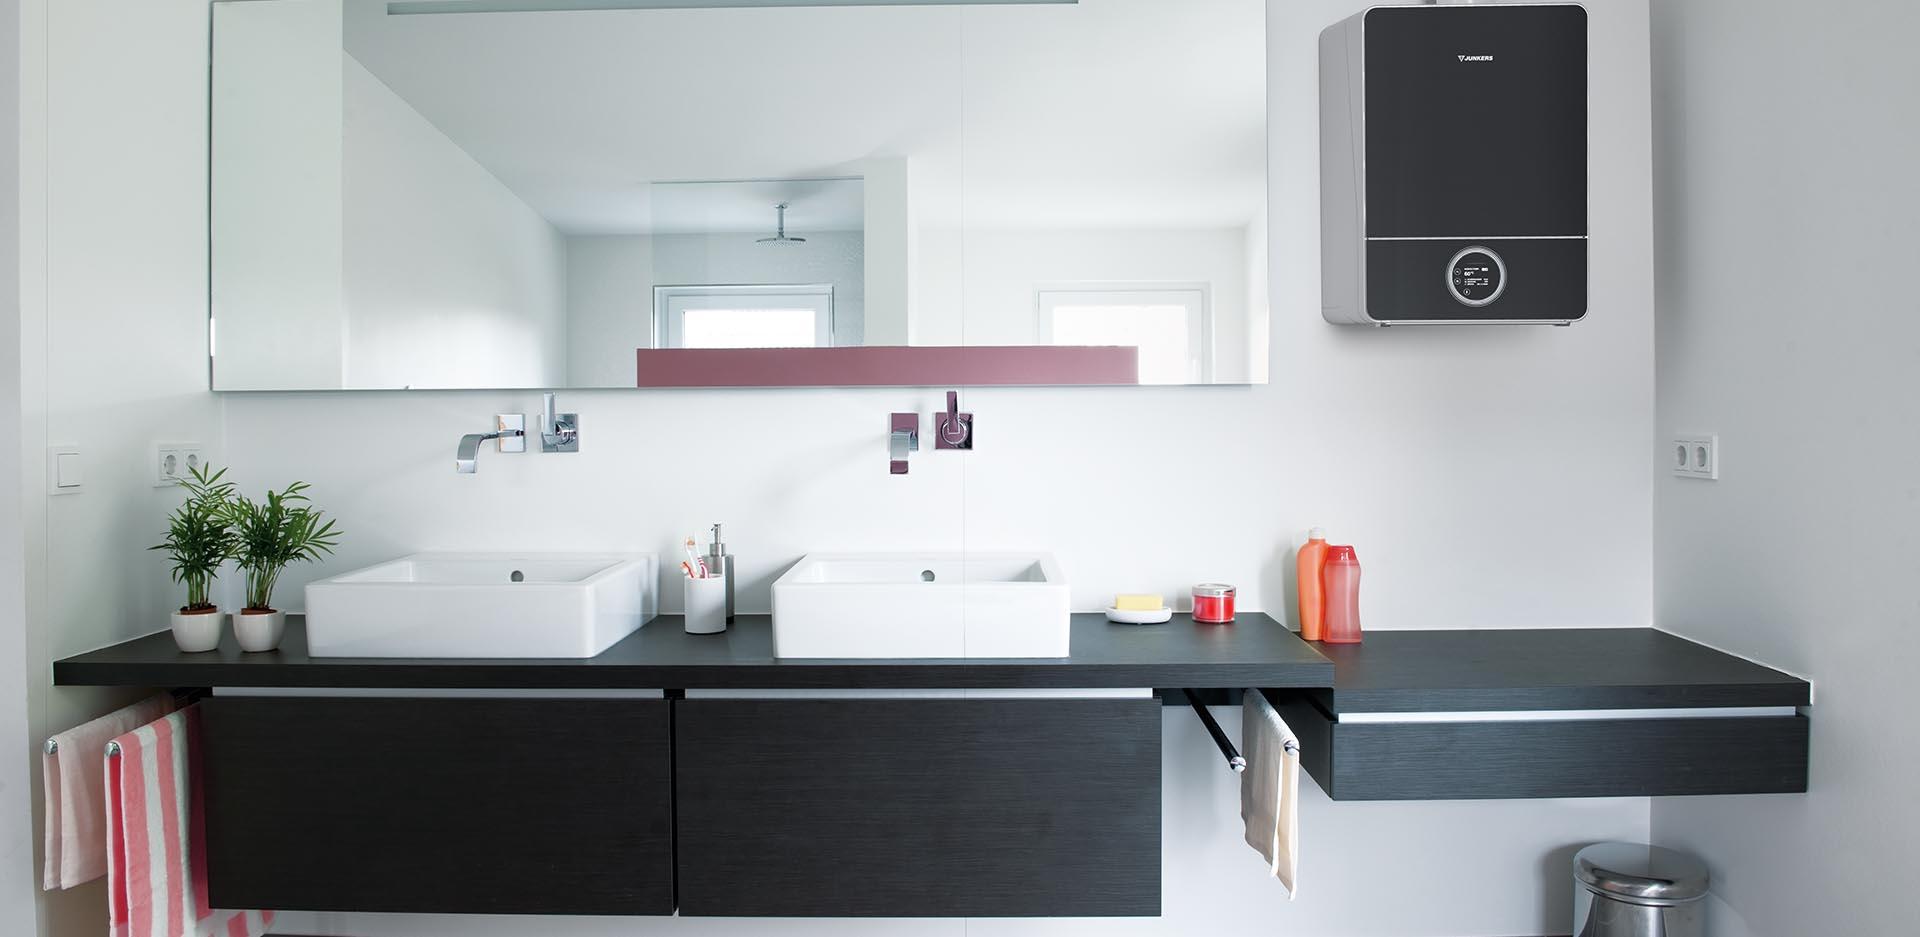 wartung heizung sanit r proff gmbh andernach. Black Bedroom Furniture Sets. Home Design Ideas